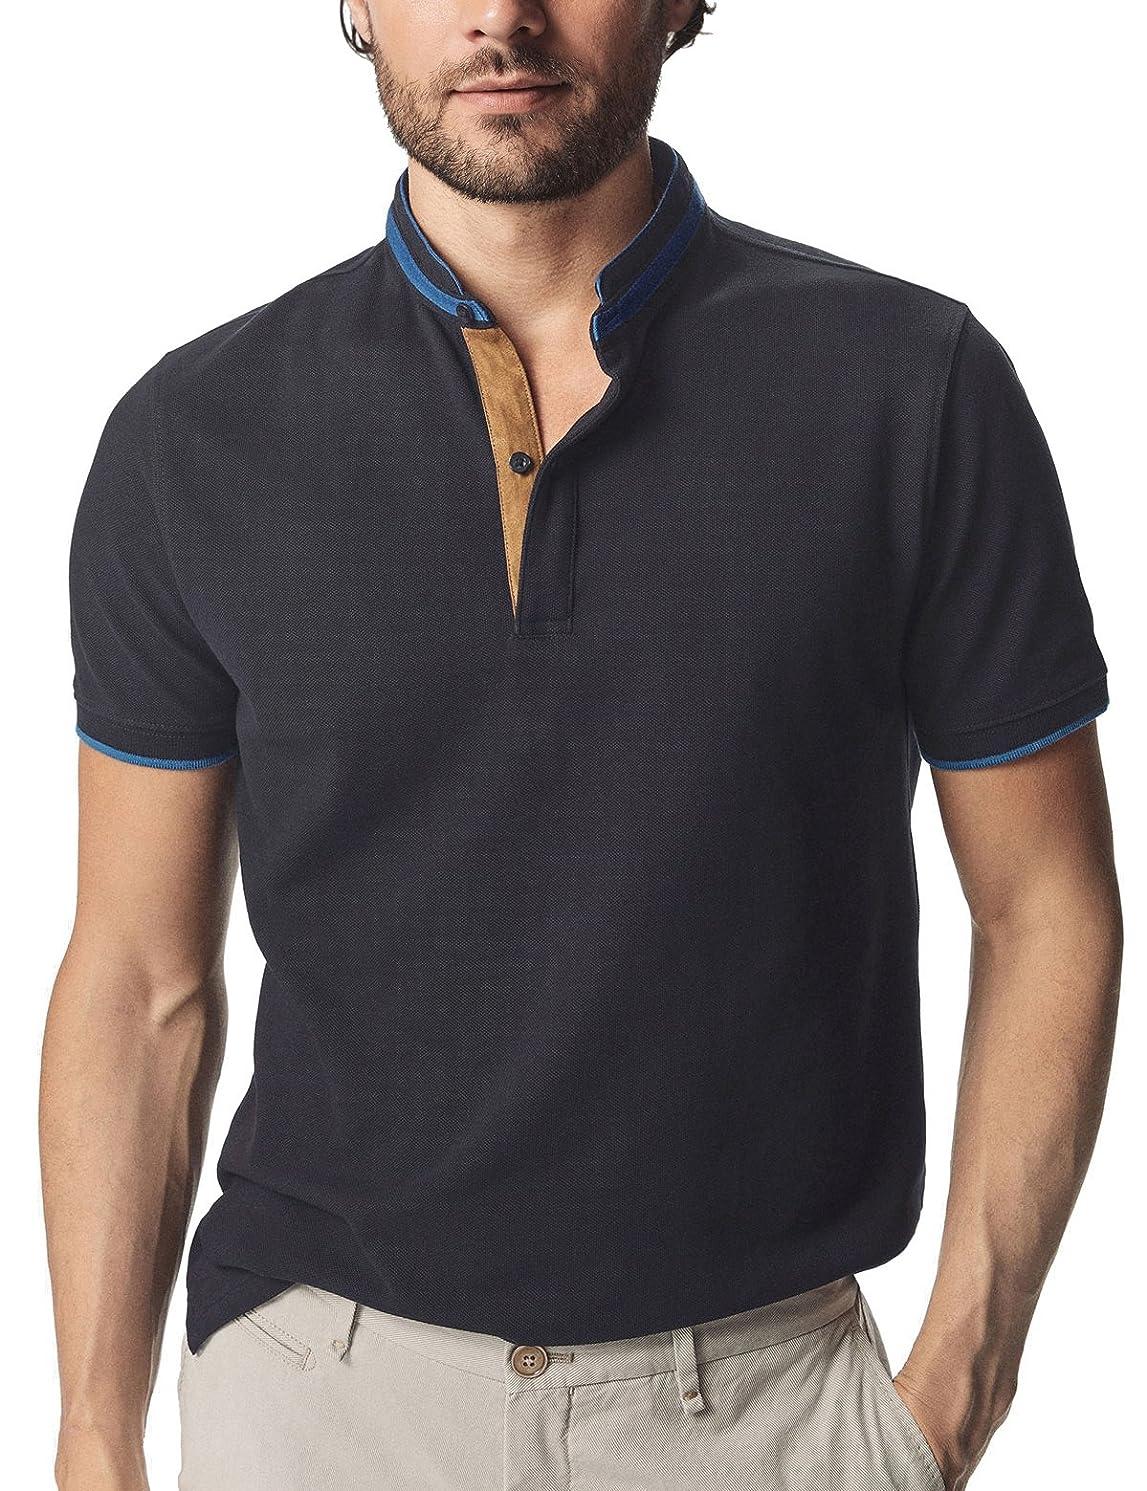 Navifalcon Mens Short Sleeve Classic Fit Cotton Pique Polo Shirt